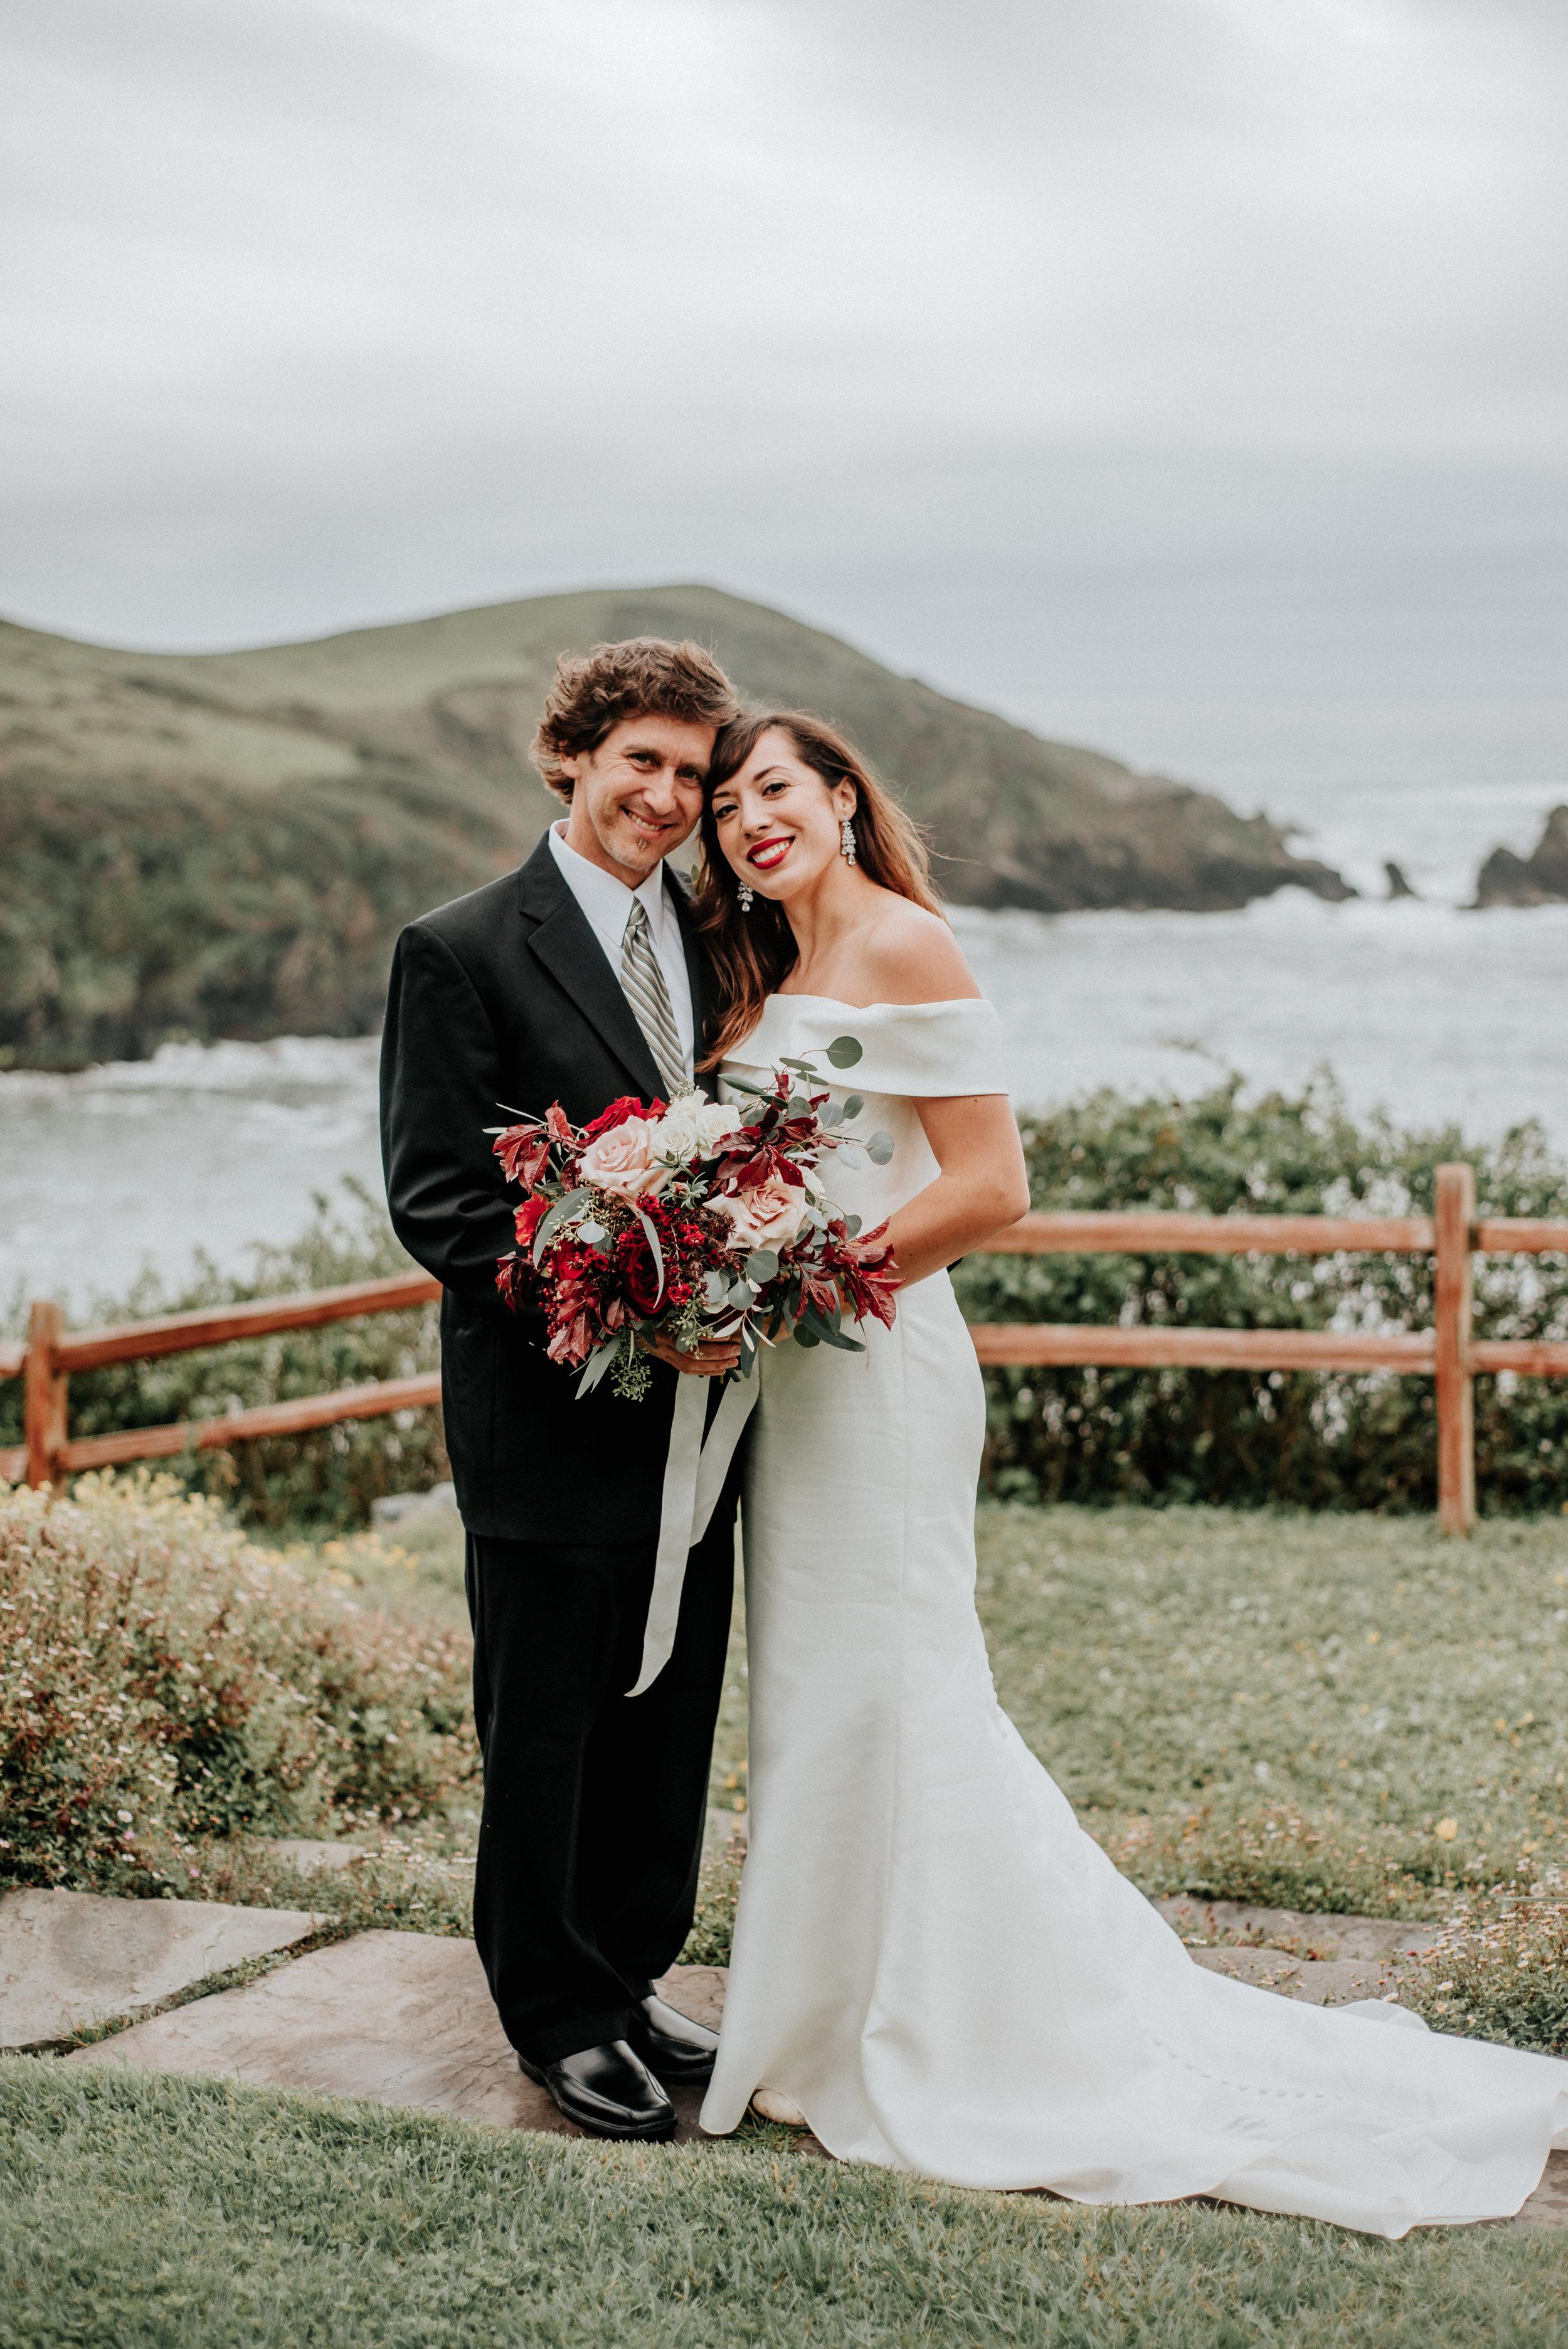 Albion River Inn Wedding in Albion Caliornia-41.jpg